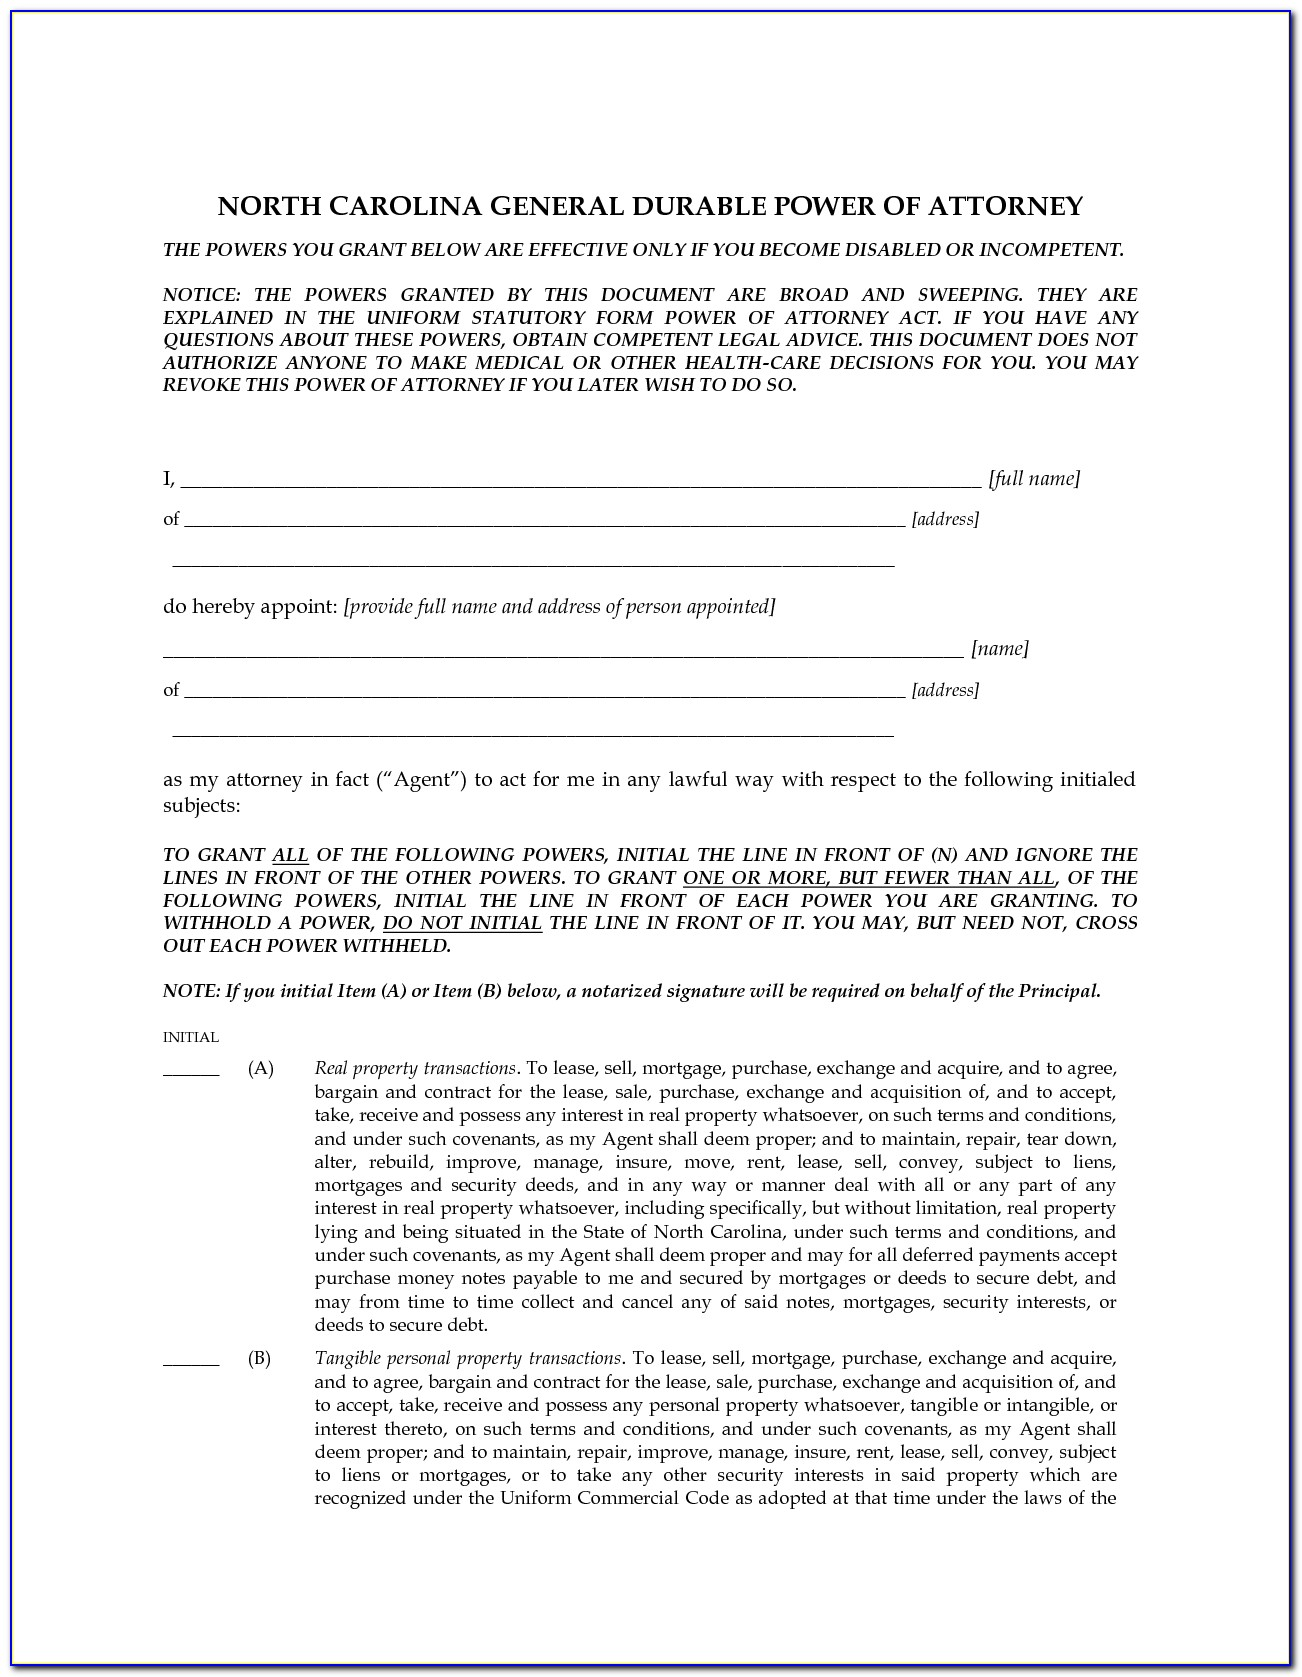 North Carolina Durable Power Of Attorney Form 2018